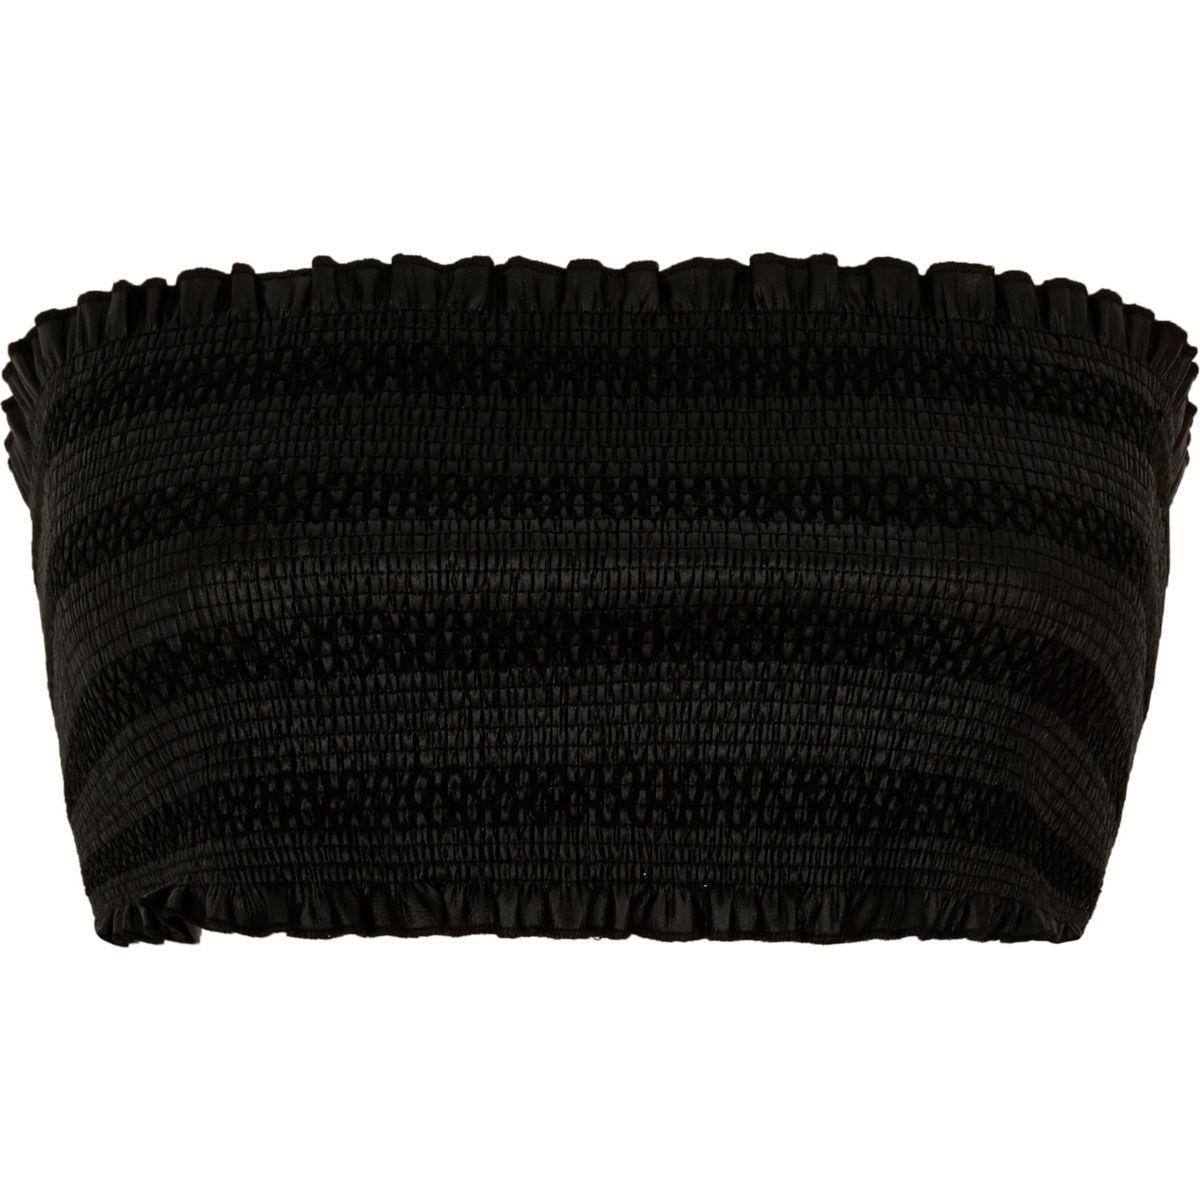 Black faux leather shirred bandeau crop top